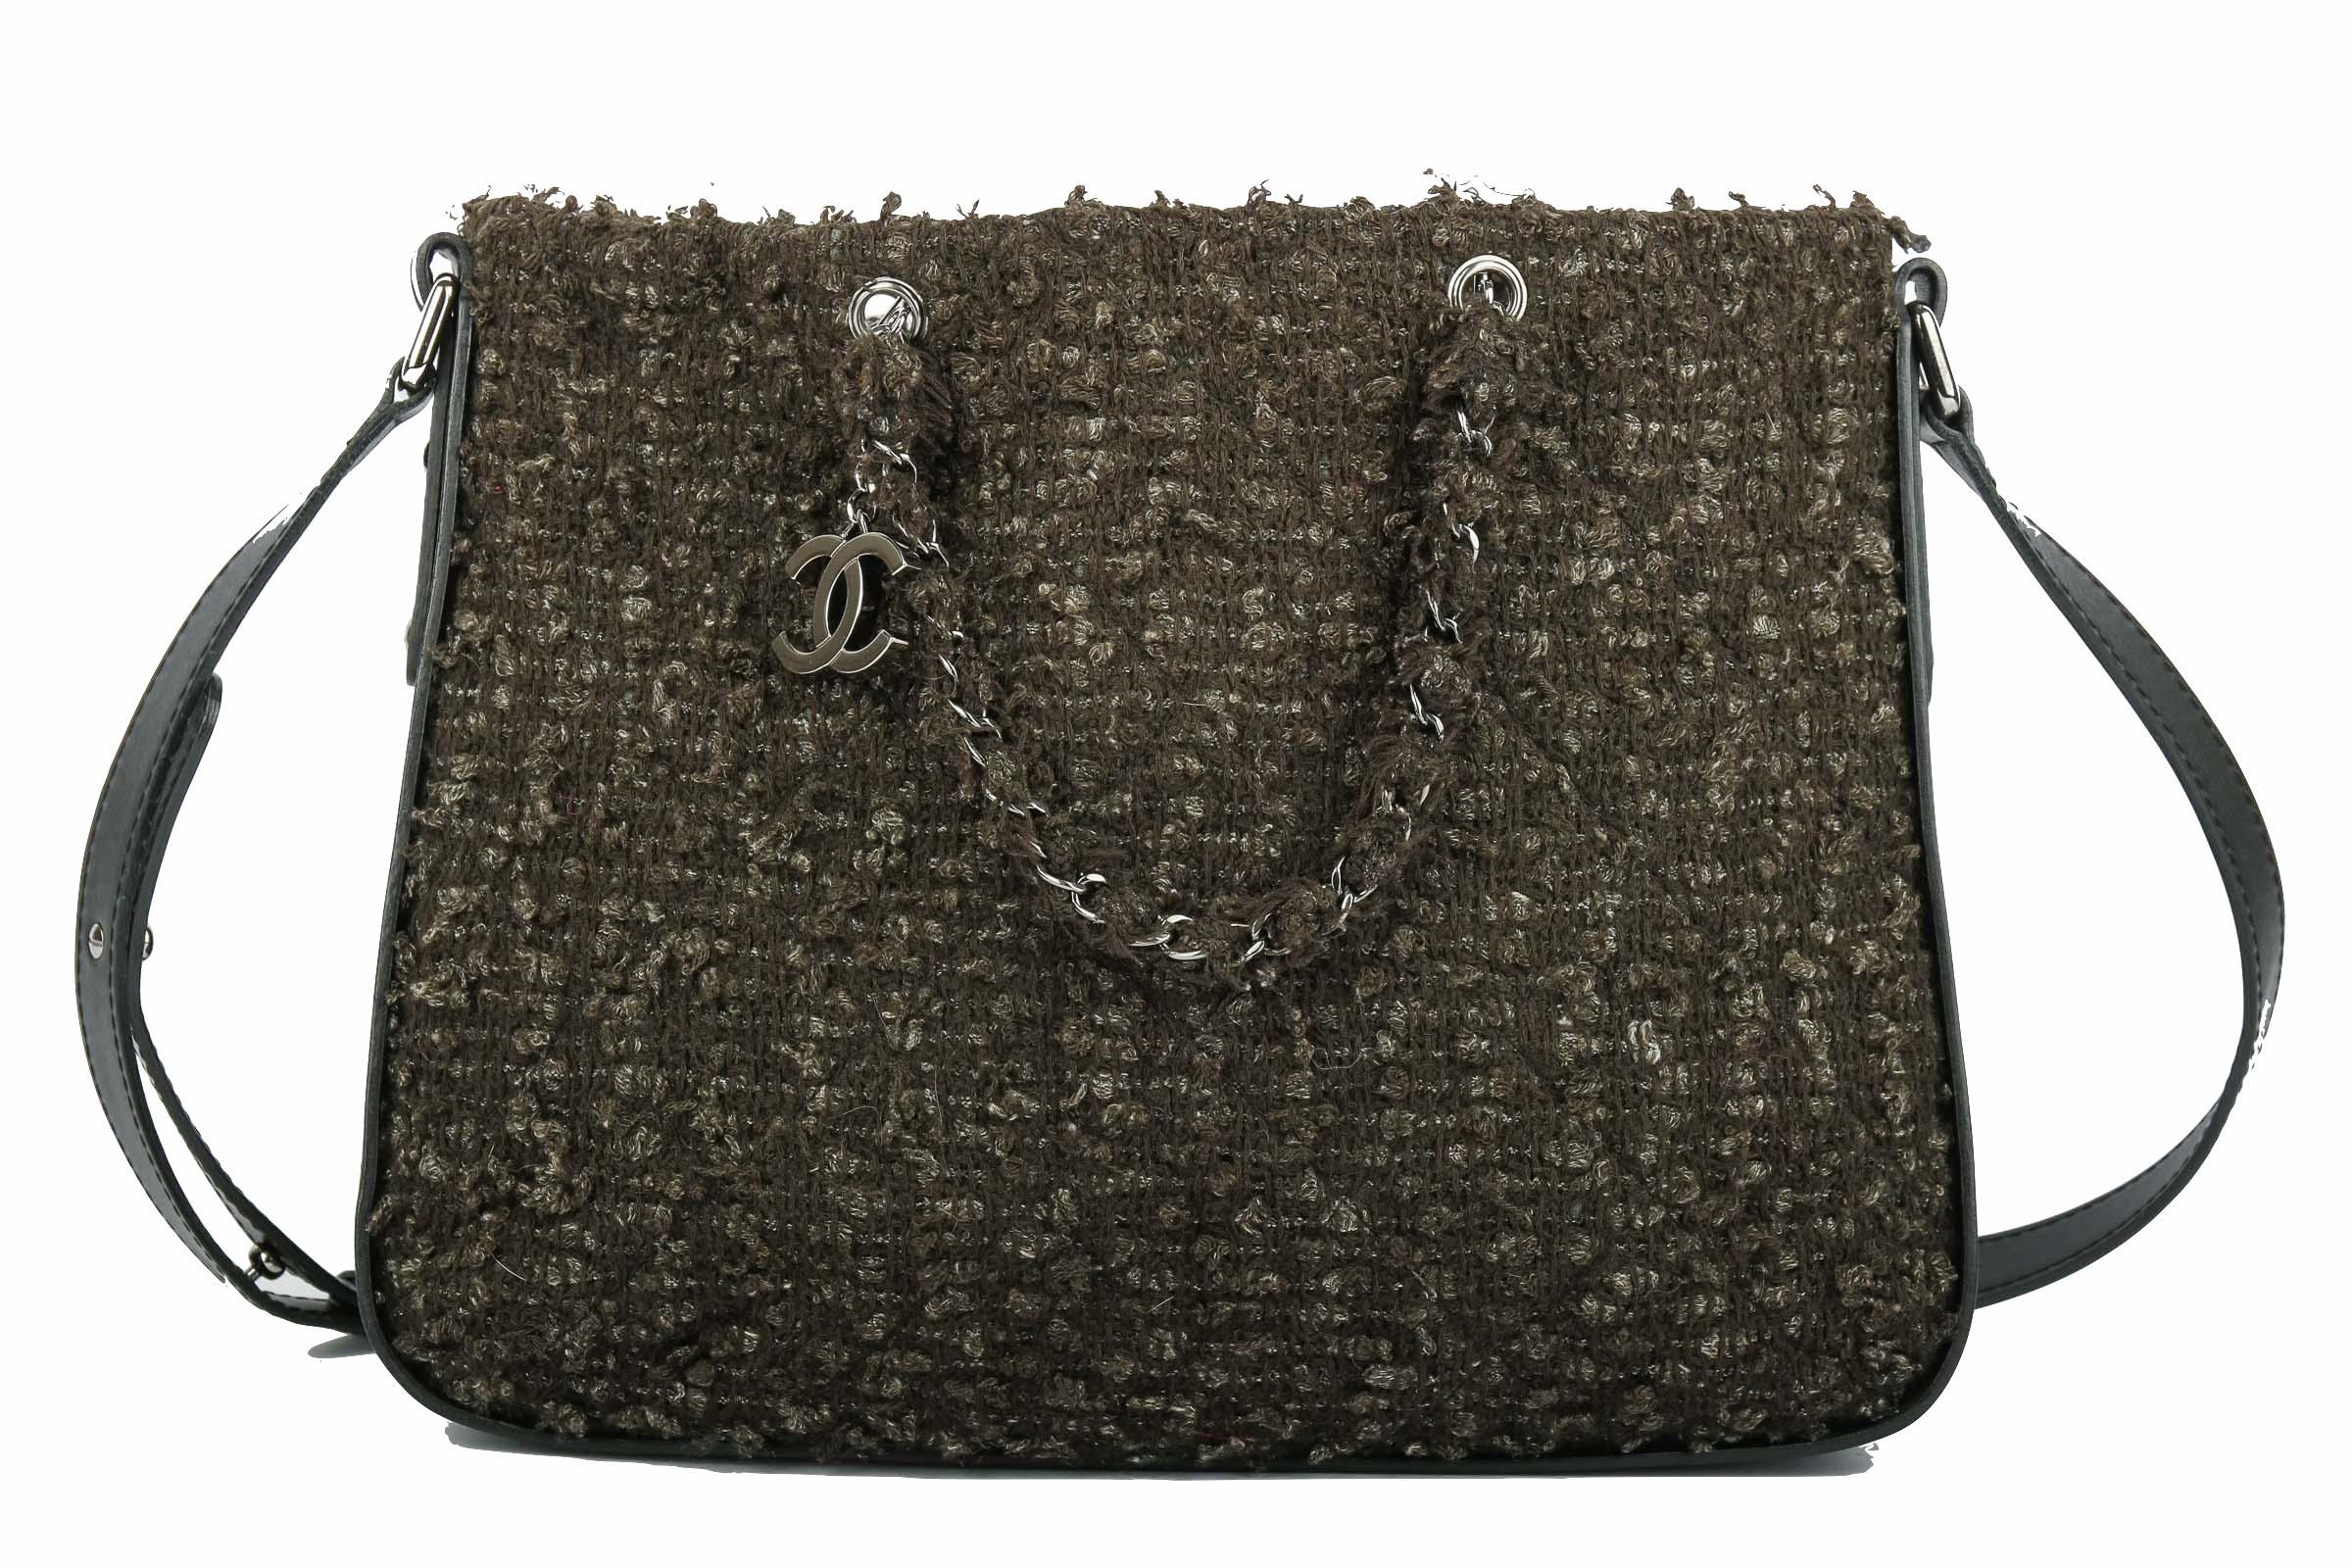 270cecc062eaf Chanel Tweed Messenger Bag Schwarz